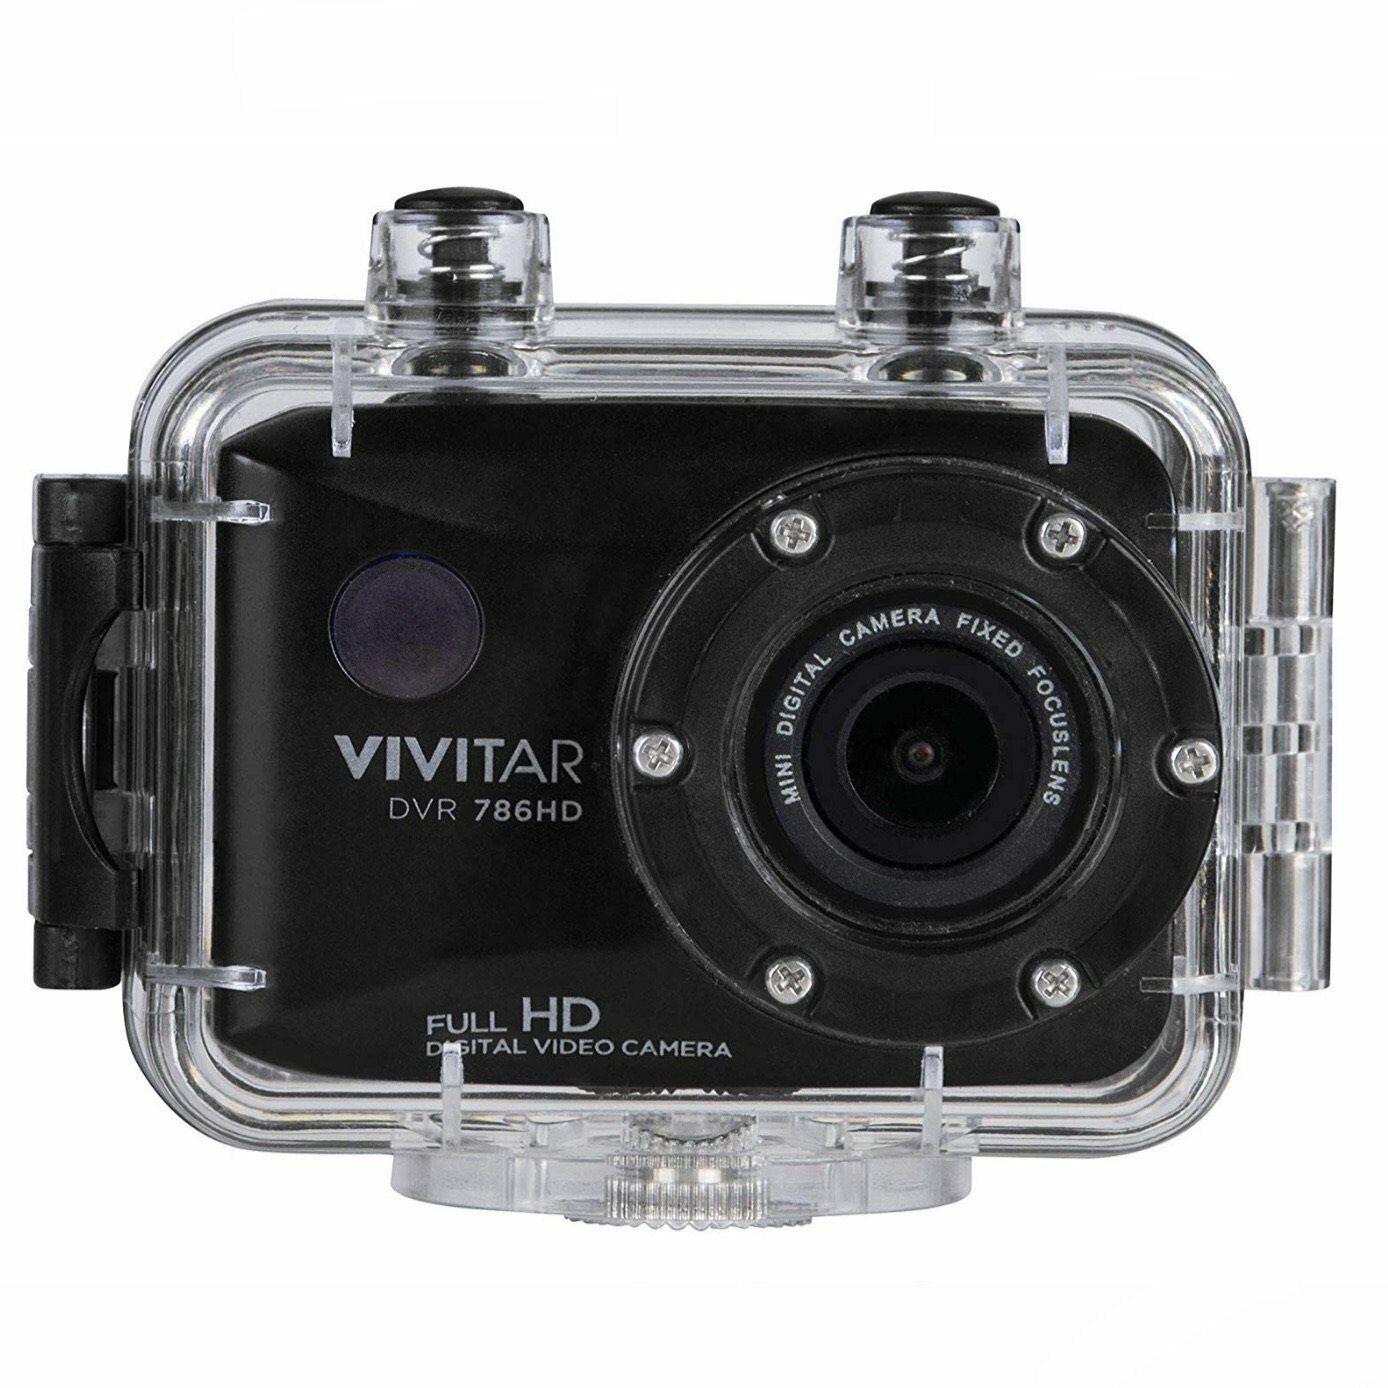 Vivitar DVR786HD 1080p HD Waterproof Action Camera + Helmet/Bike Mounts - Black 1080p action black camera dvr786hd mounts vivitar waterproof